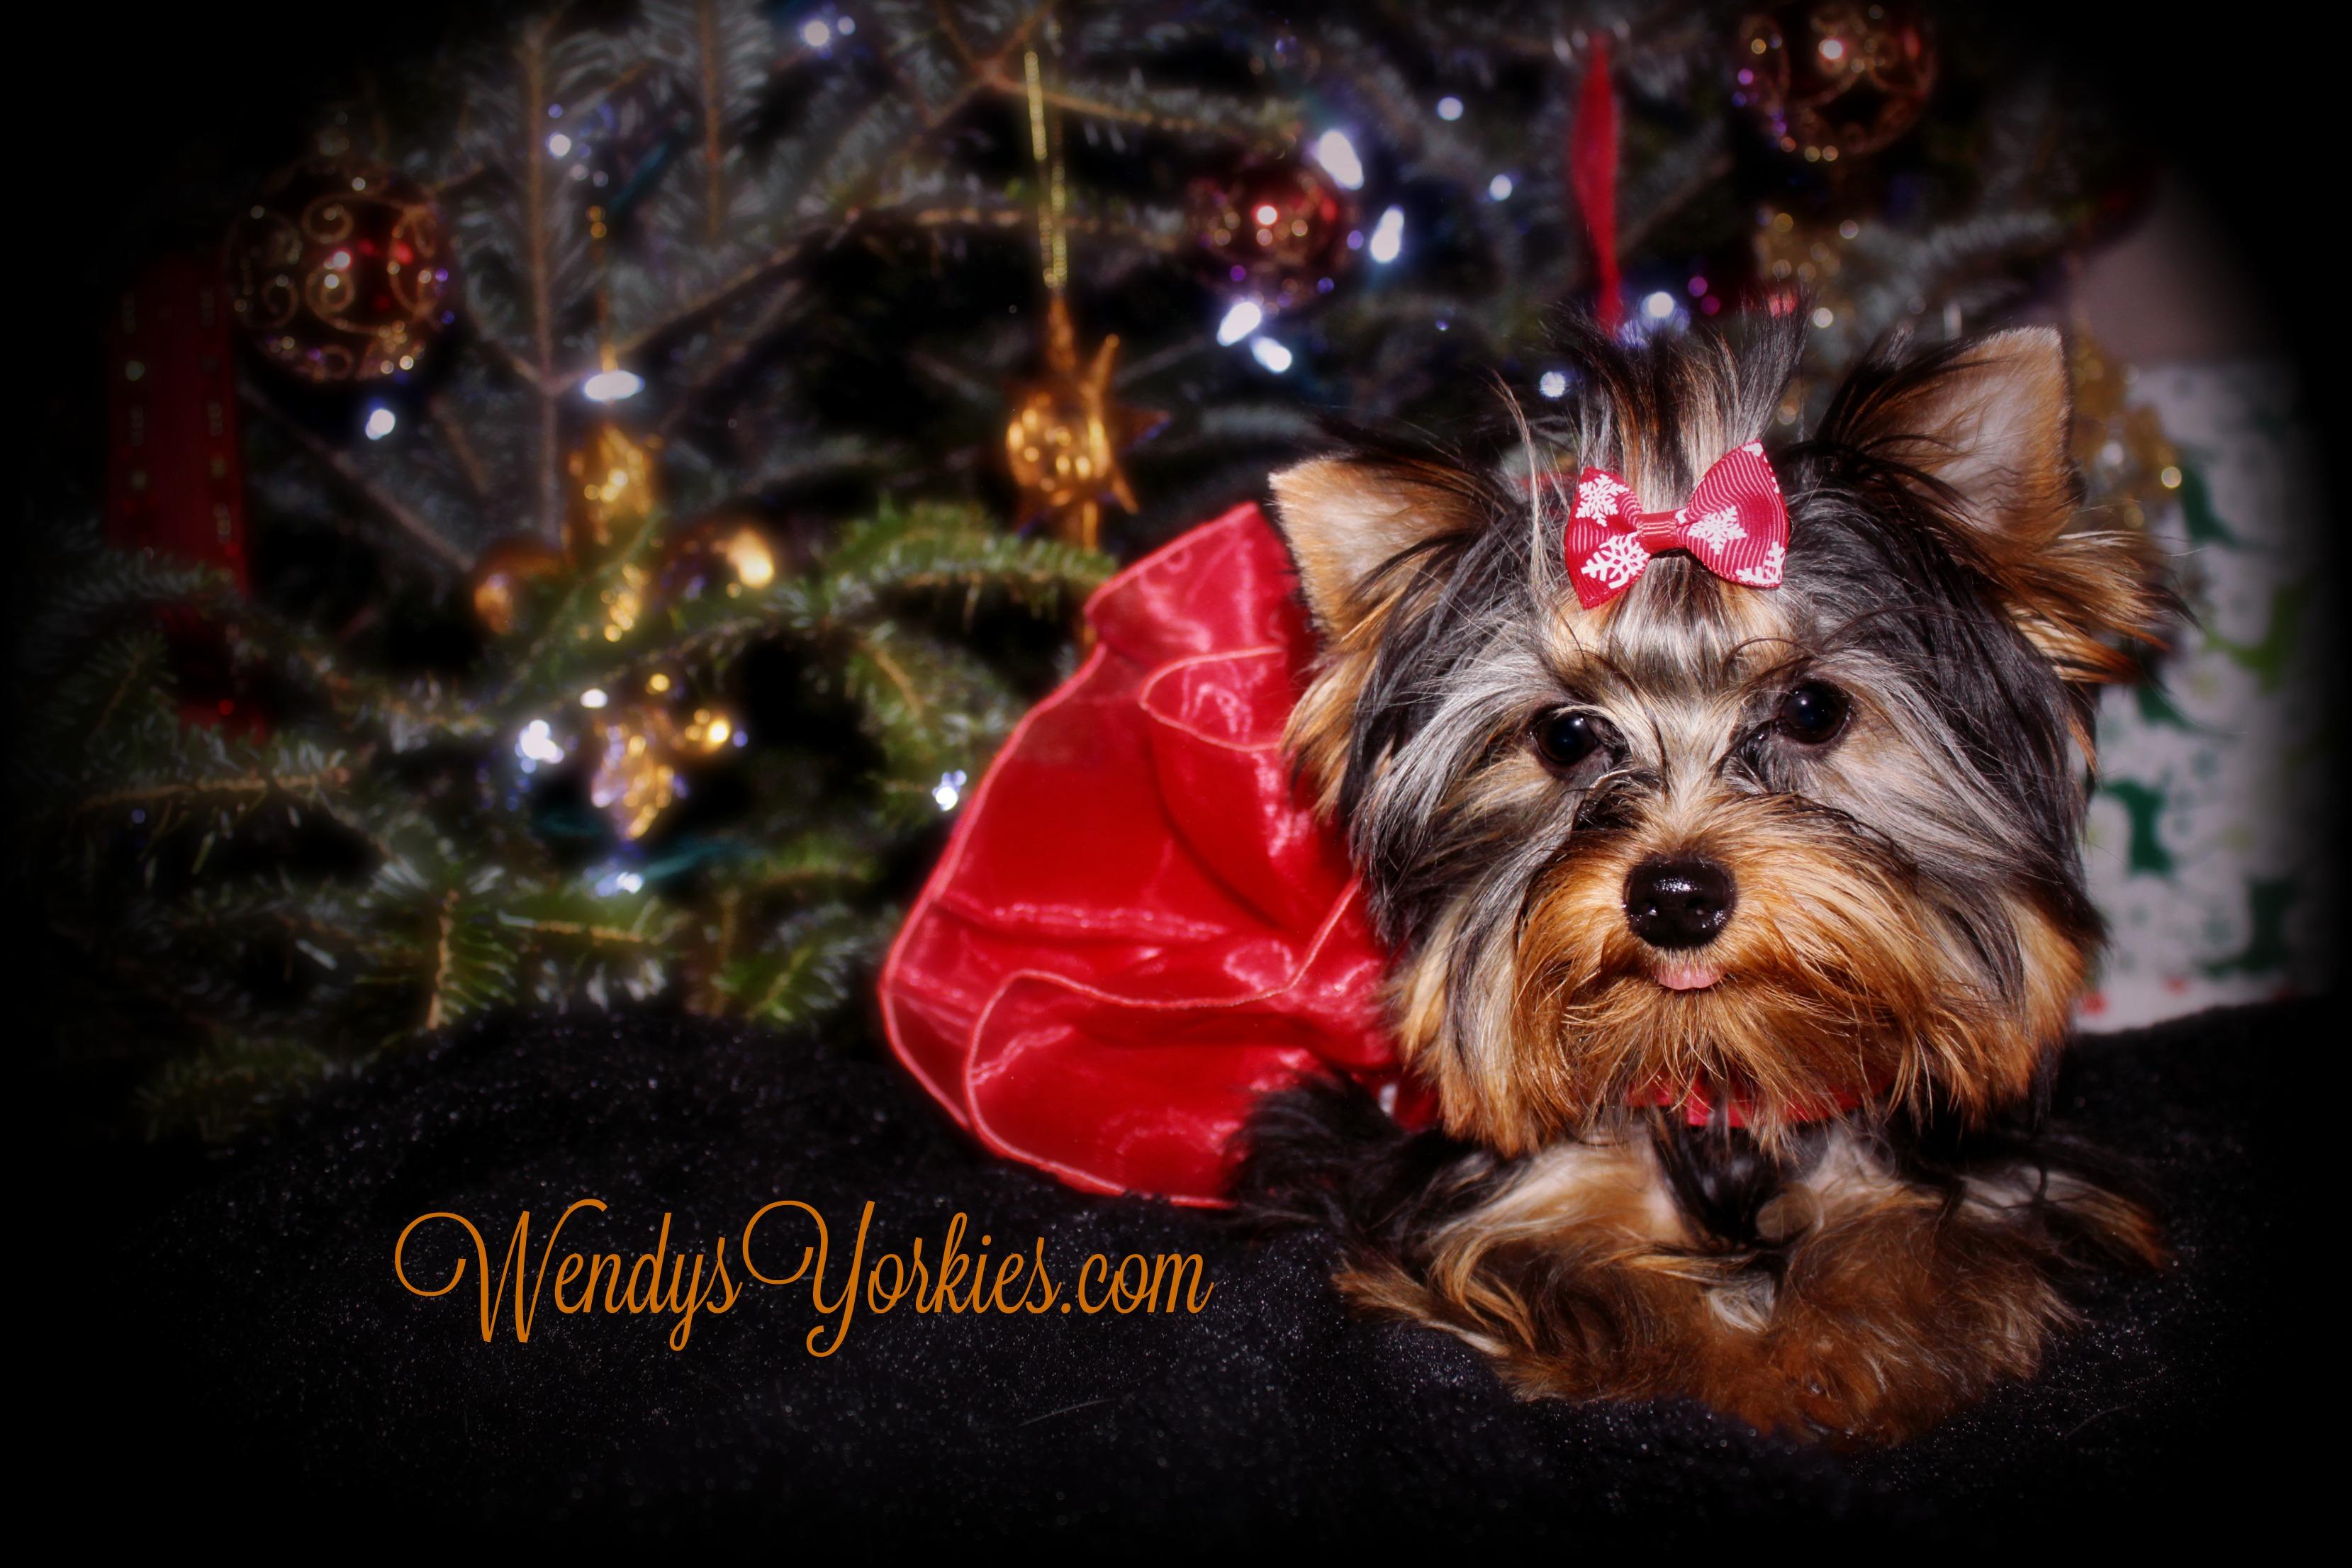 Yorkie puppies for sale, WendysYorkies.com, Abby2.0